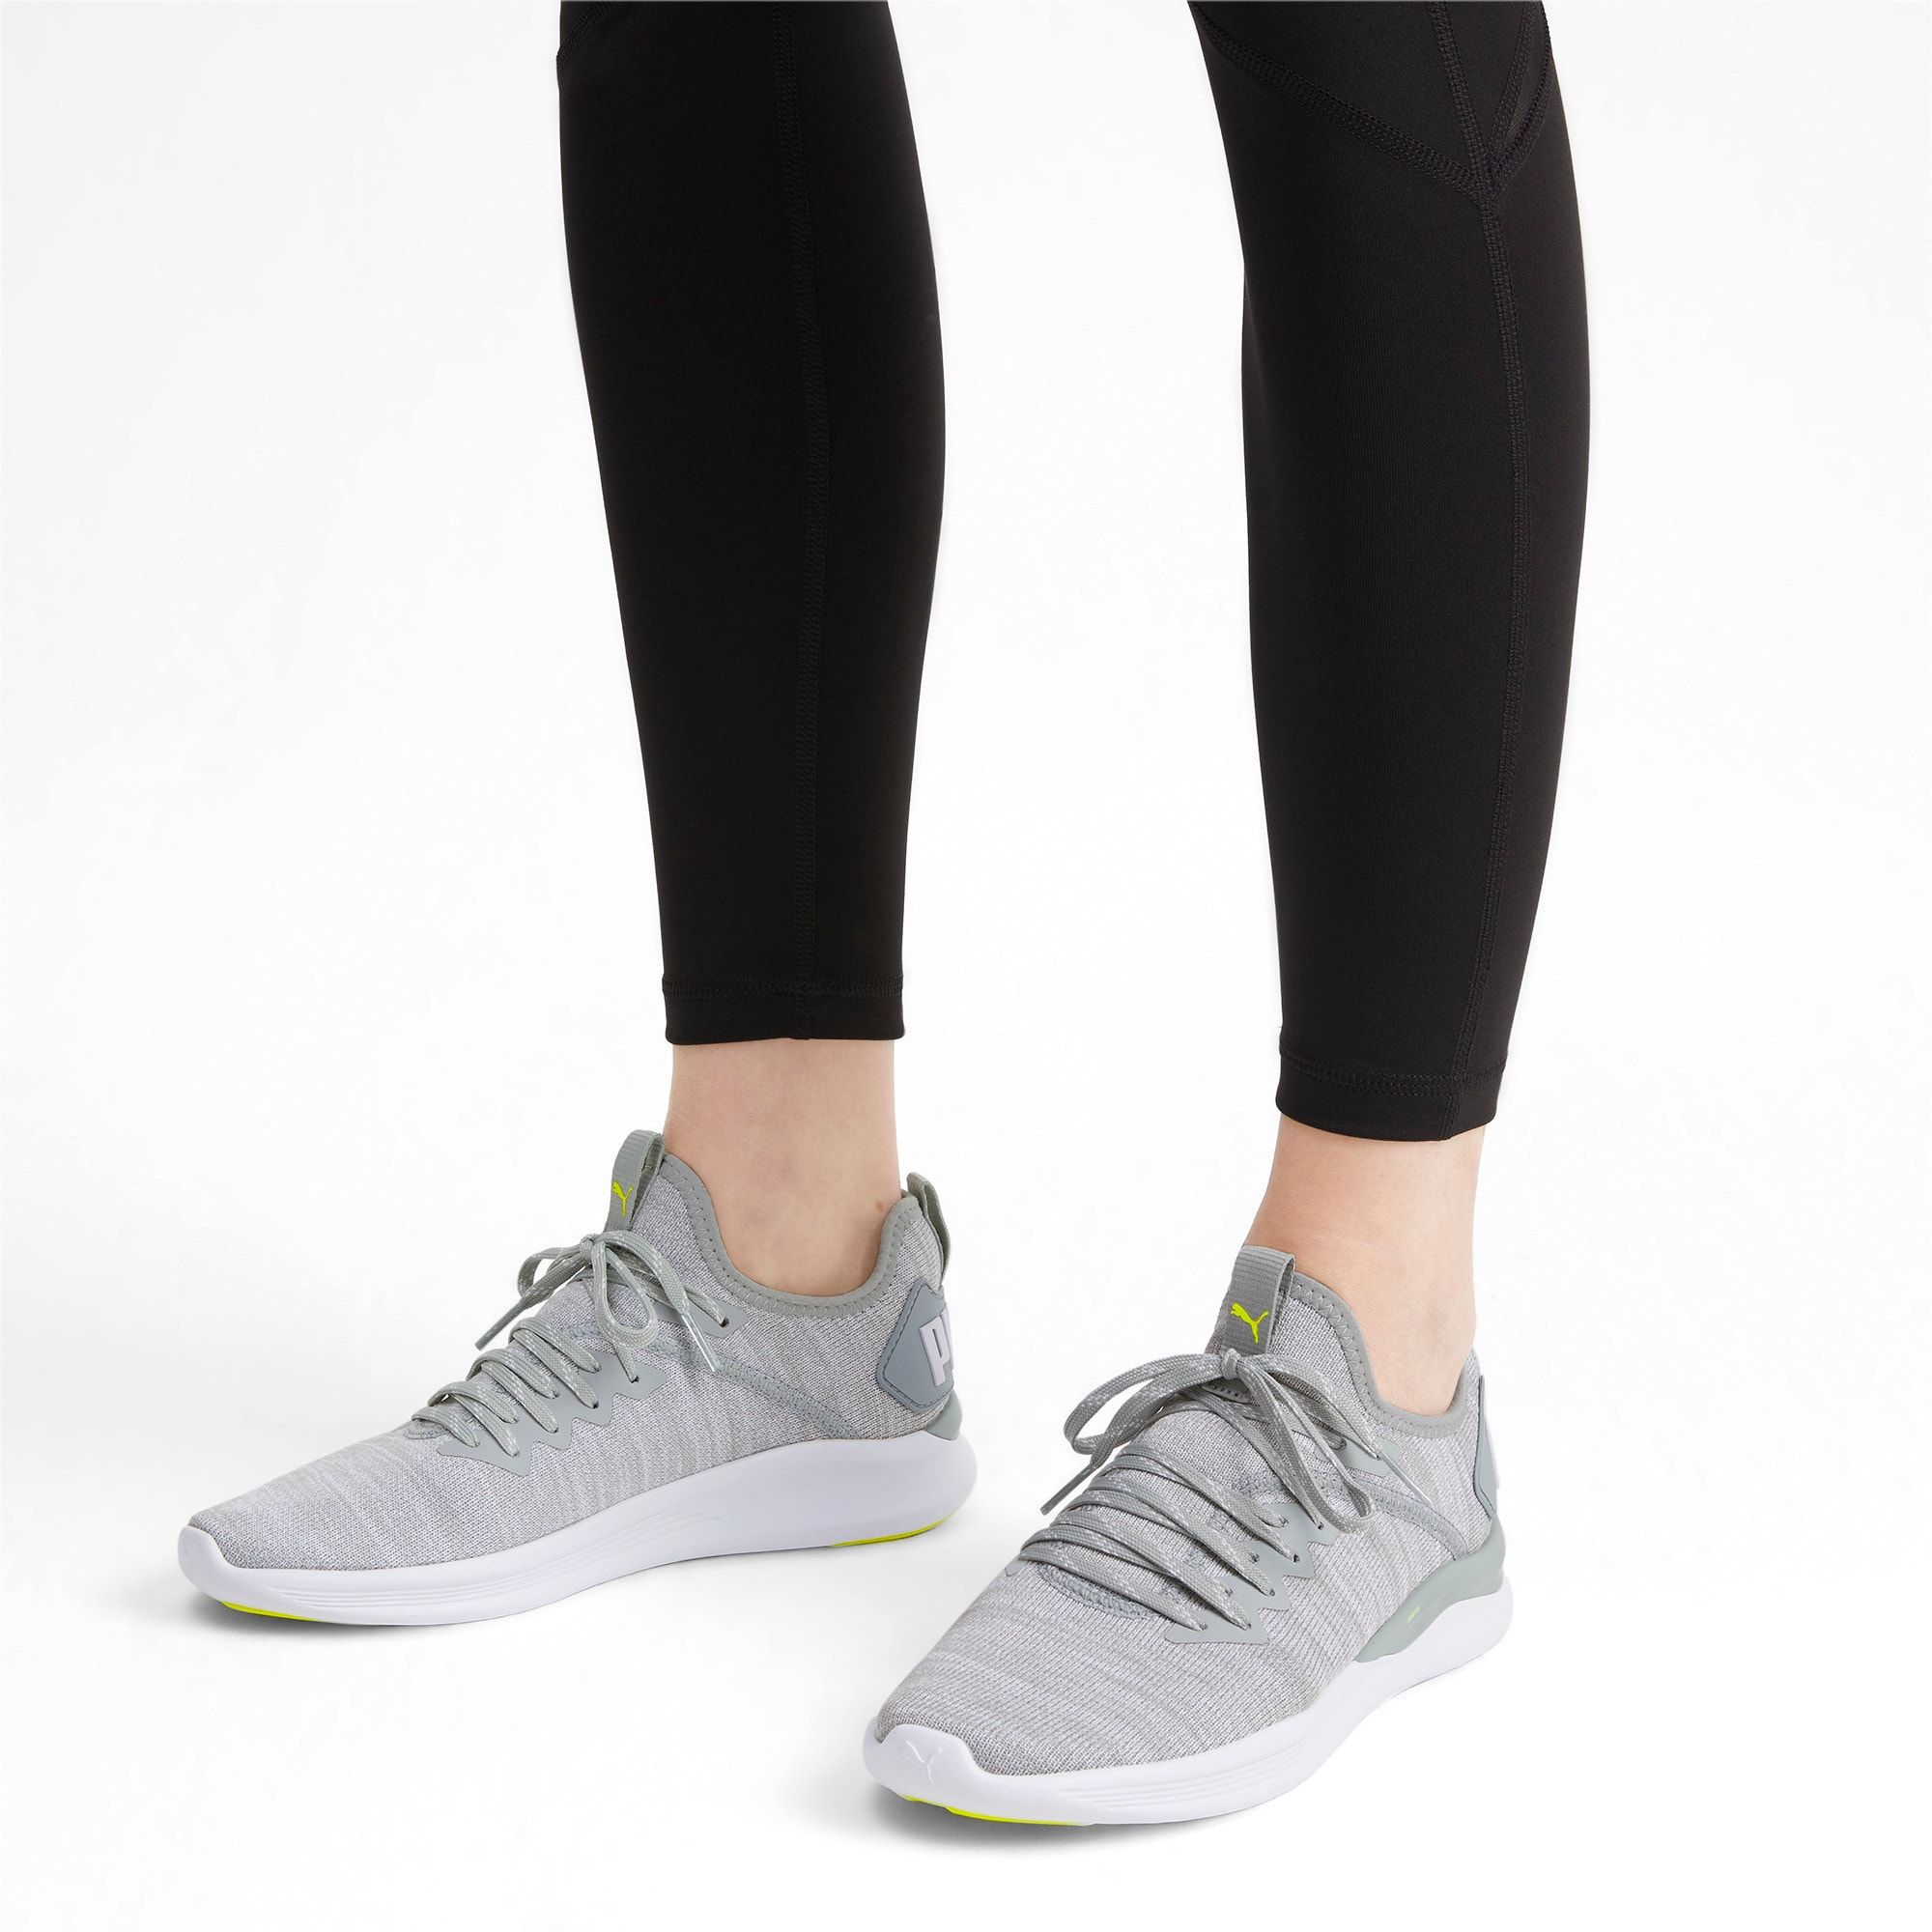 PUMA Ignite Flash EvoKnit Women's Running Shoes in Quarry